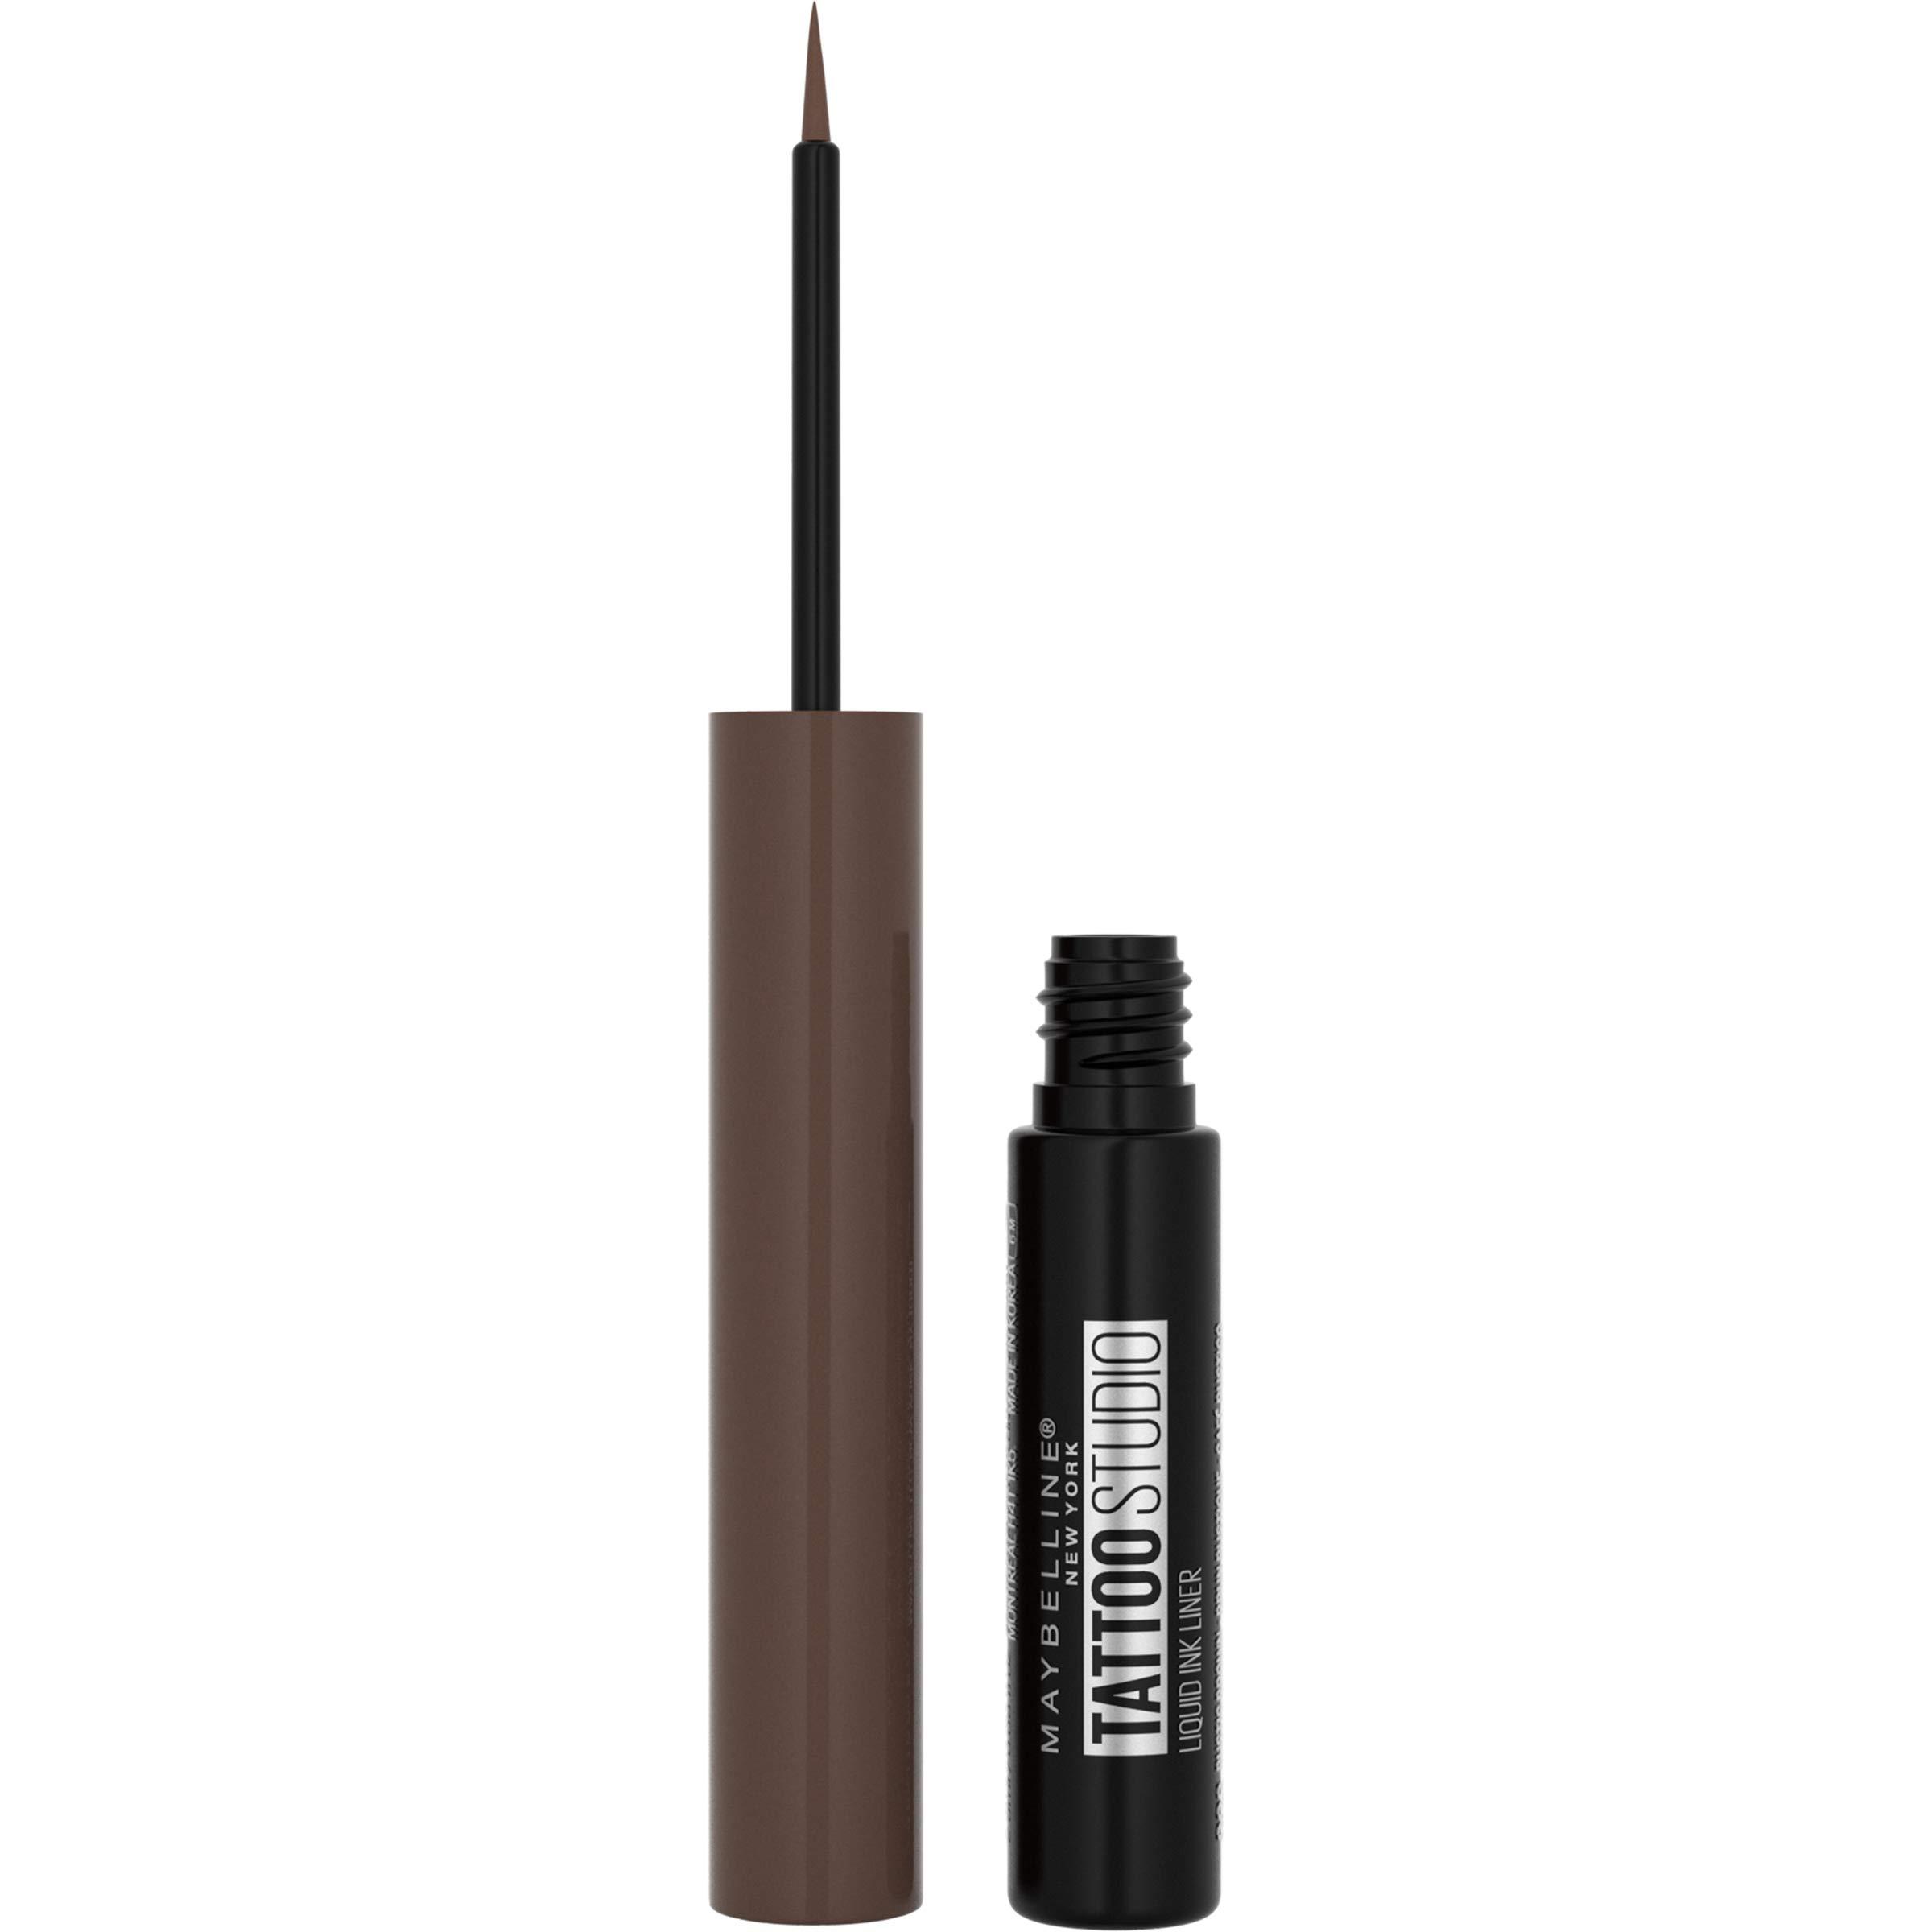 Maybelline TattooStudio Liquid Ink Liner Up To 36HR Wear, Sweat Resistant, Smudge Resistant, No Mess Removal, Longwear Liquid Eyeliner Makeup, Rustic Brown, 0.08 fl. oz.